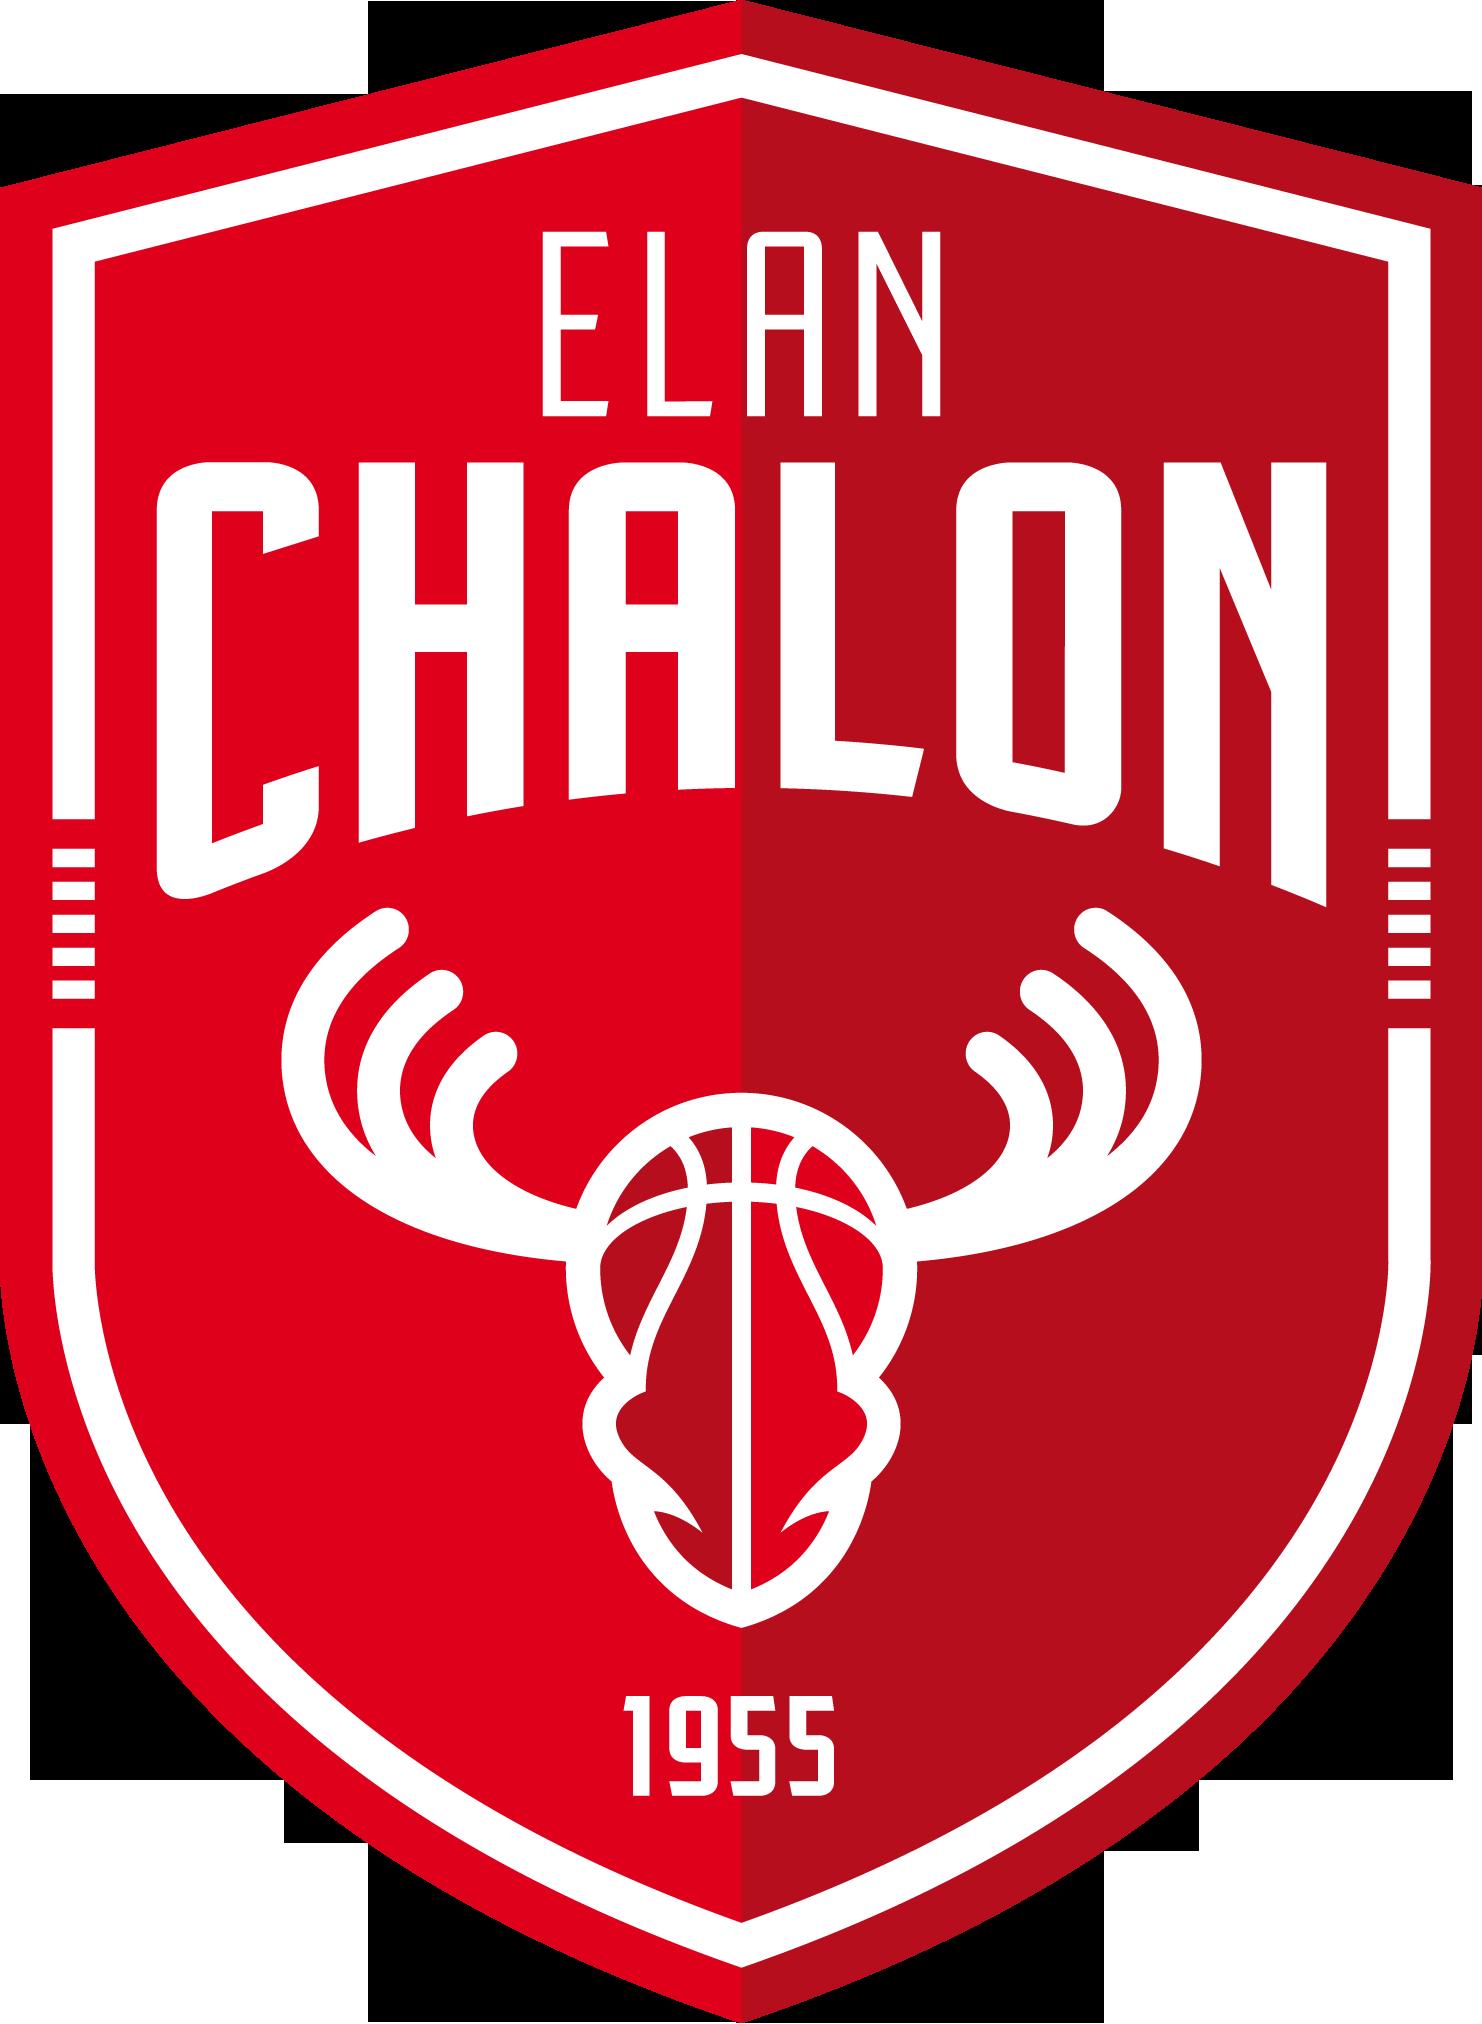 Boutique Elan Chalon